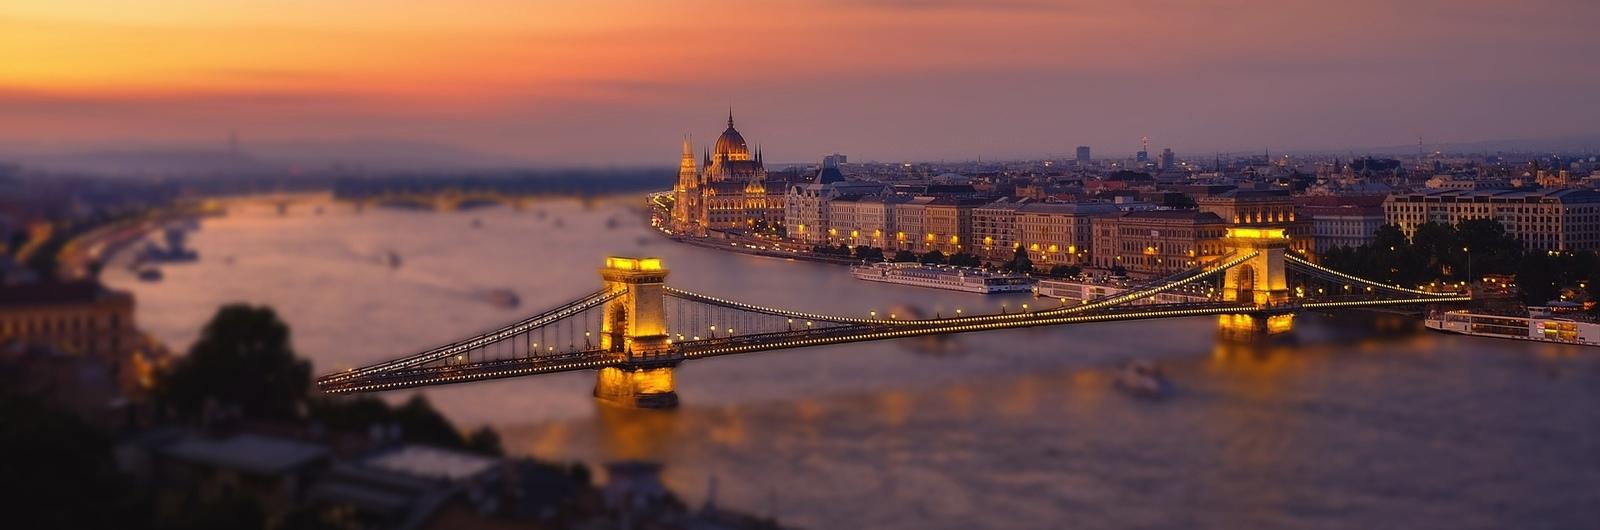 budapest city header